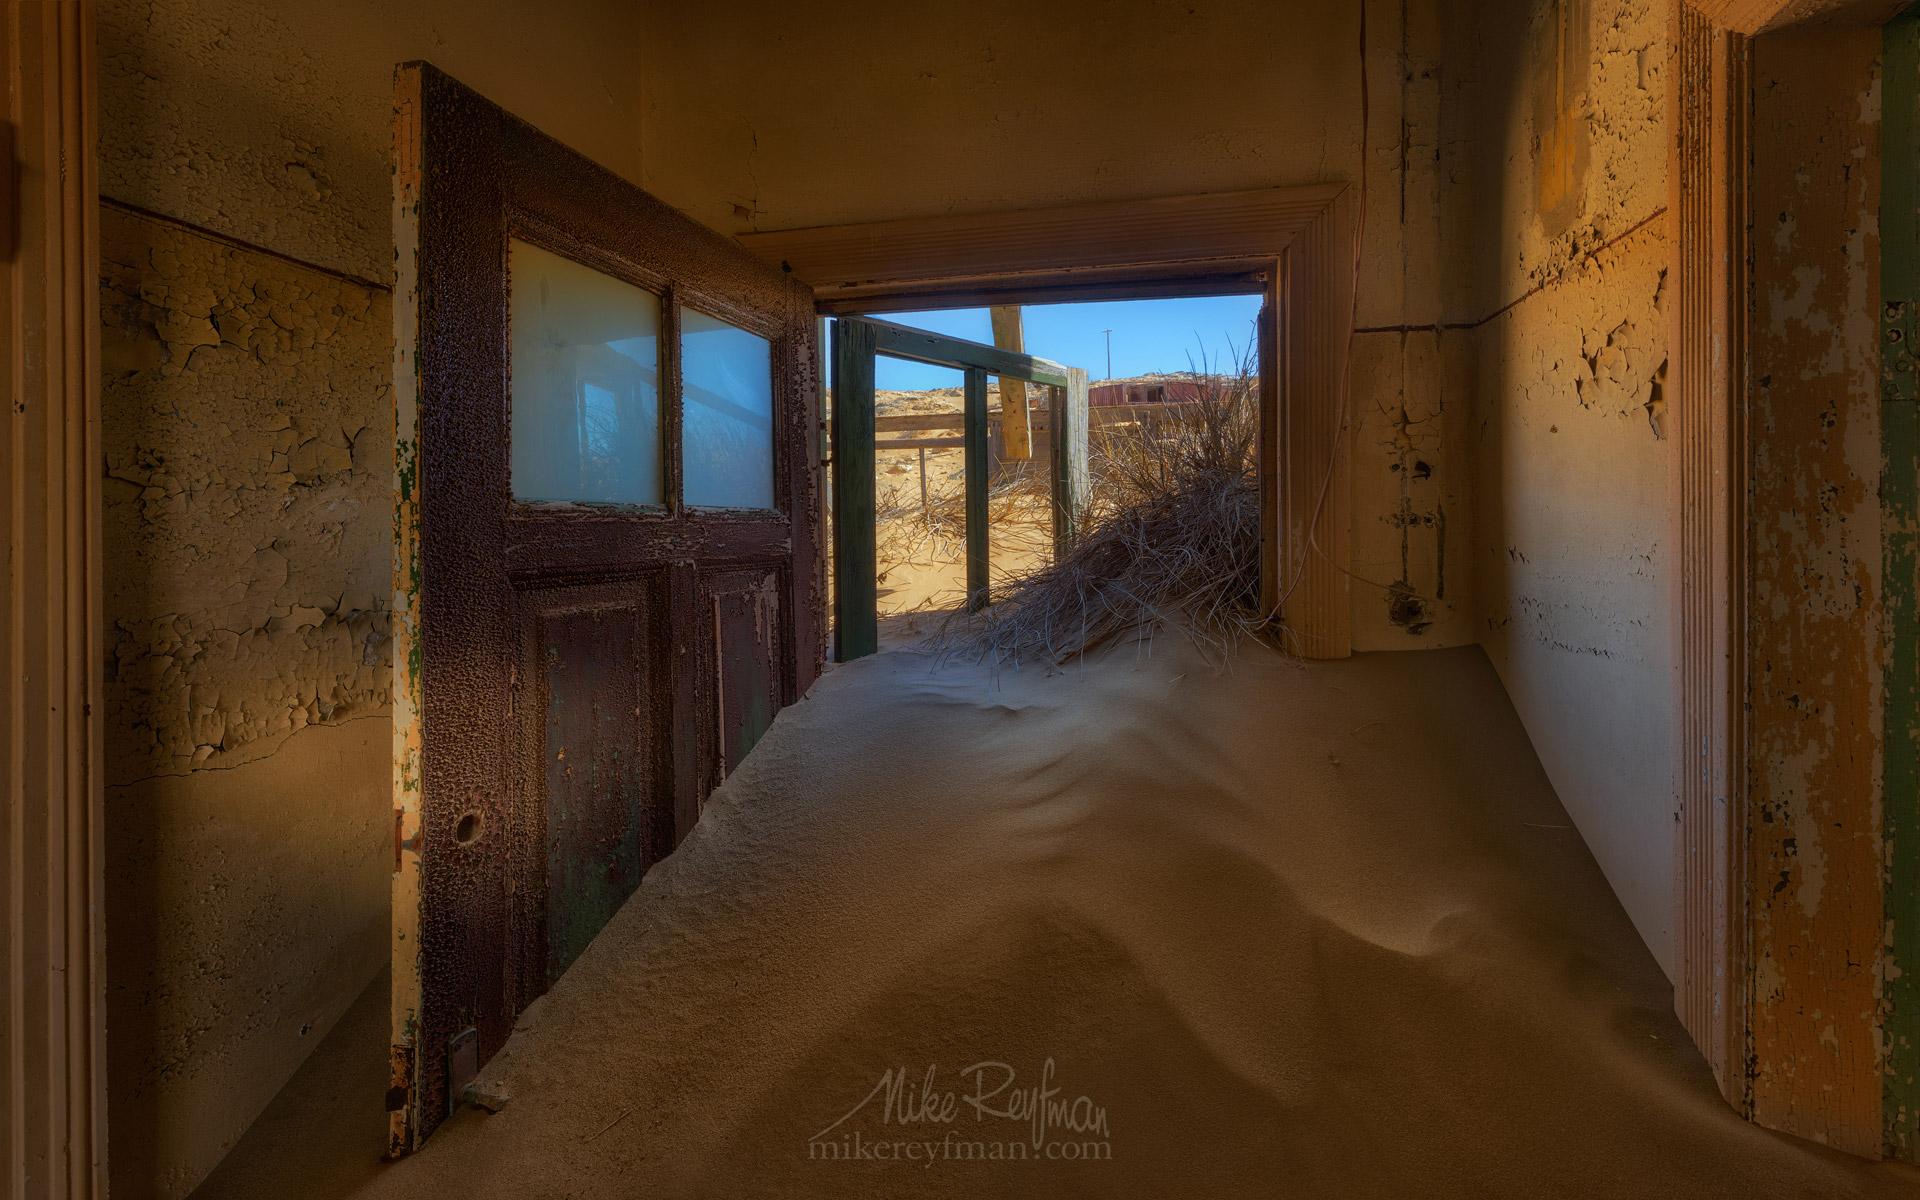 Sands of Time. Kolmanskop Ghost town, Namib Desert ...